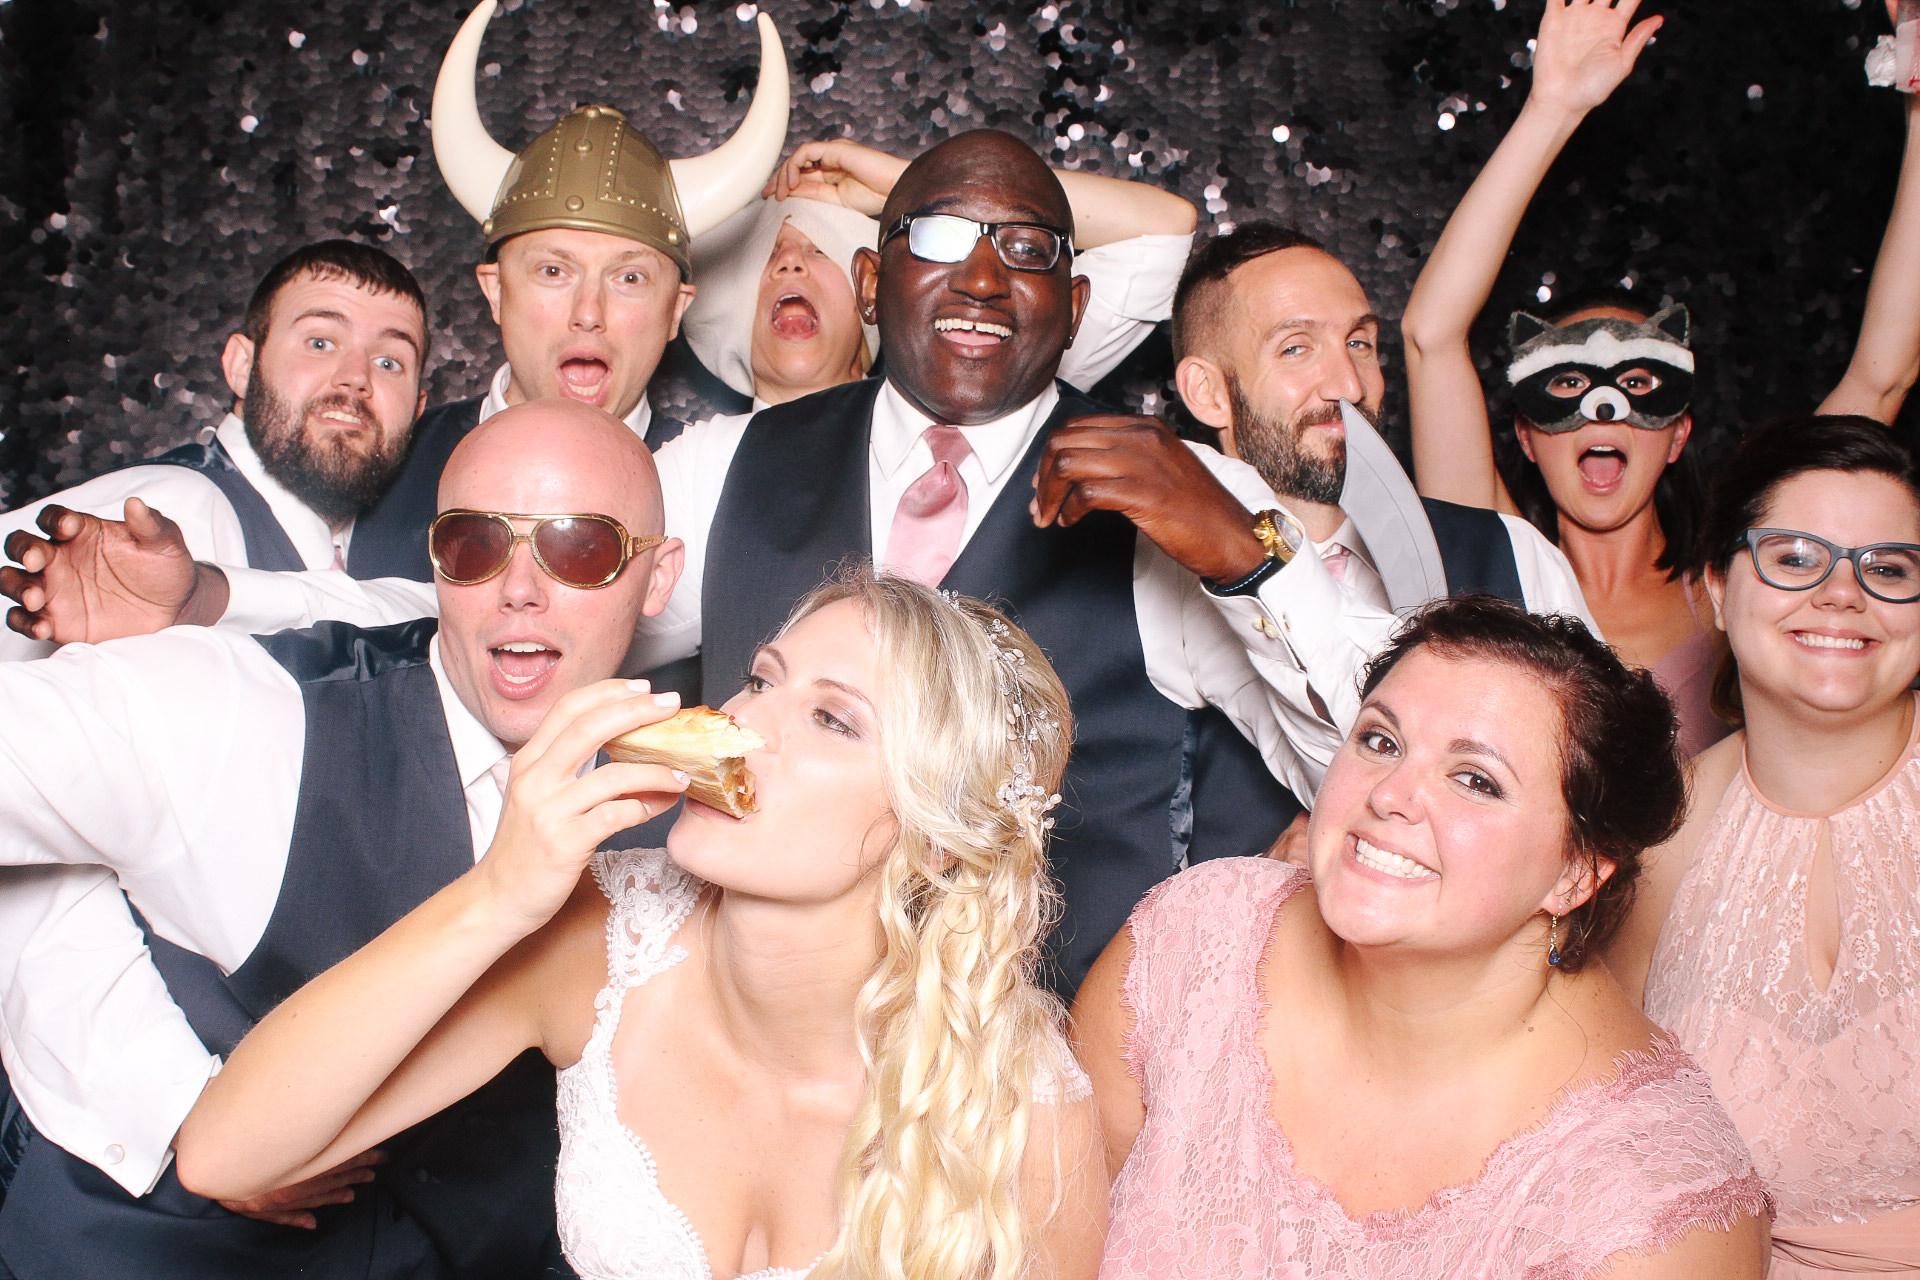 Westfall Event Center Wedding Photobooth 00278.jpg